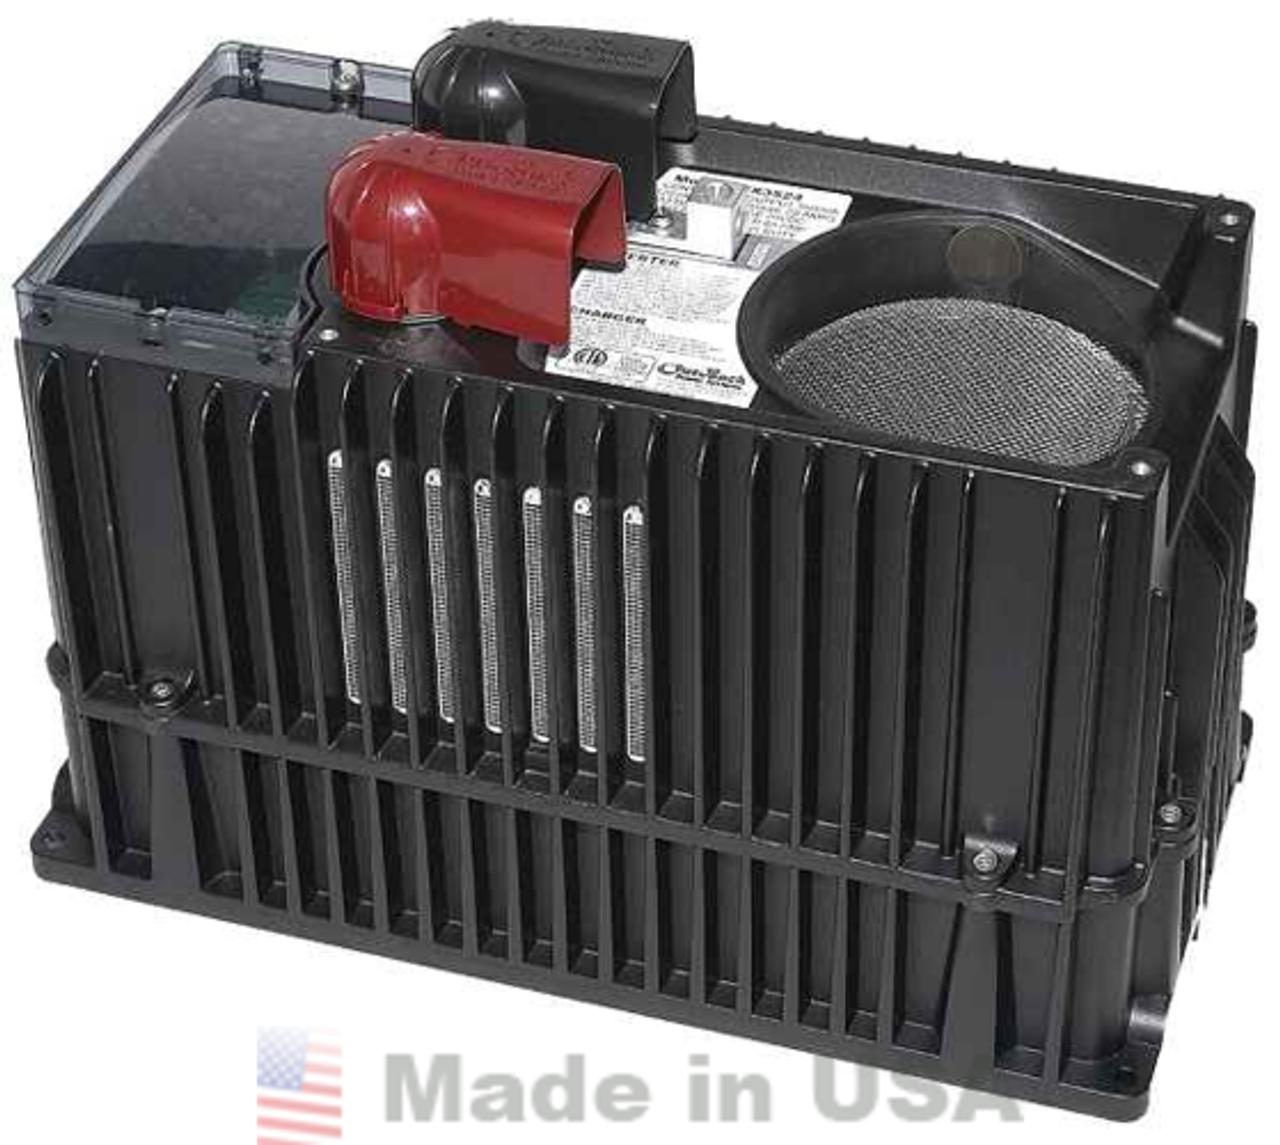 Outback Power VFX3524M Vented Off Grid Mobile/Marine Inverter/Charger